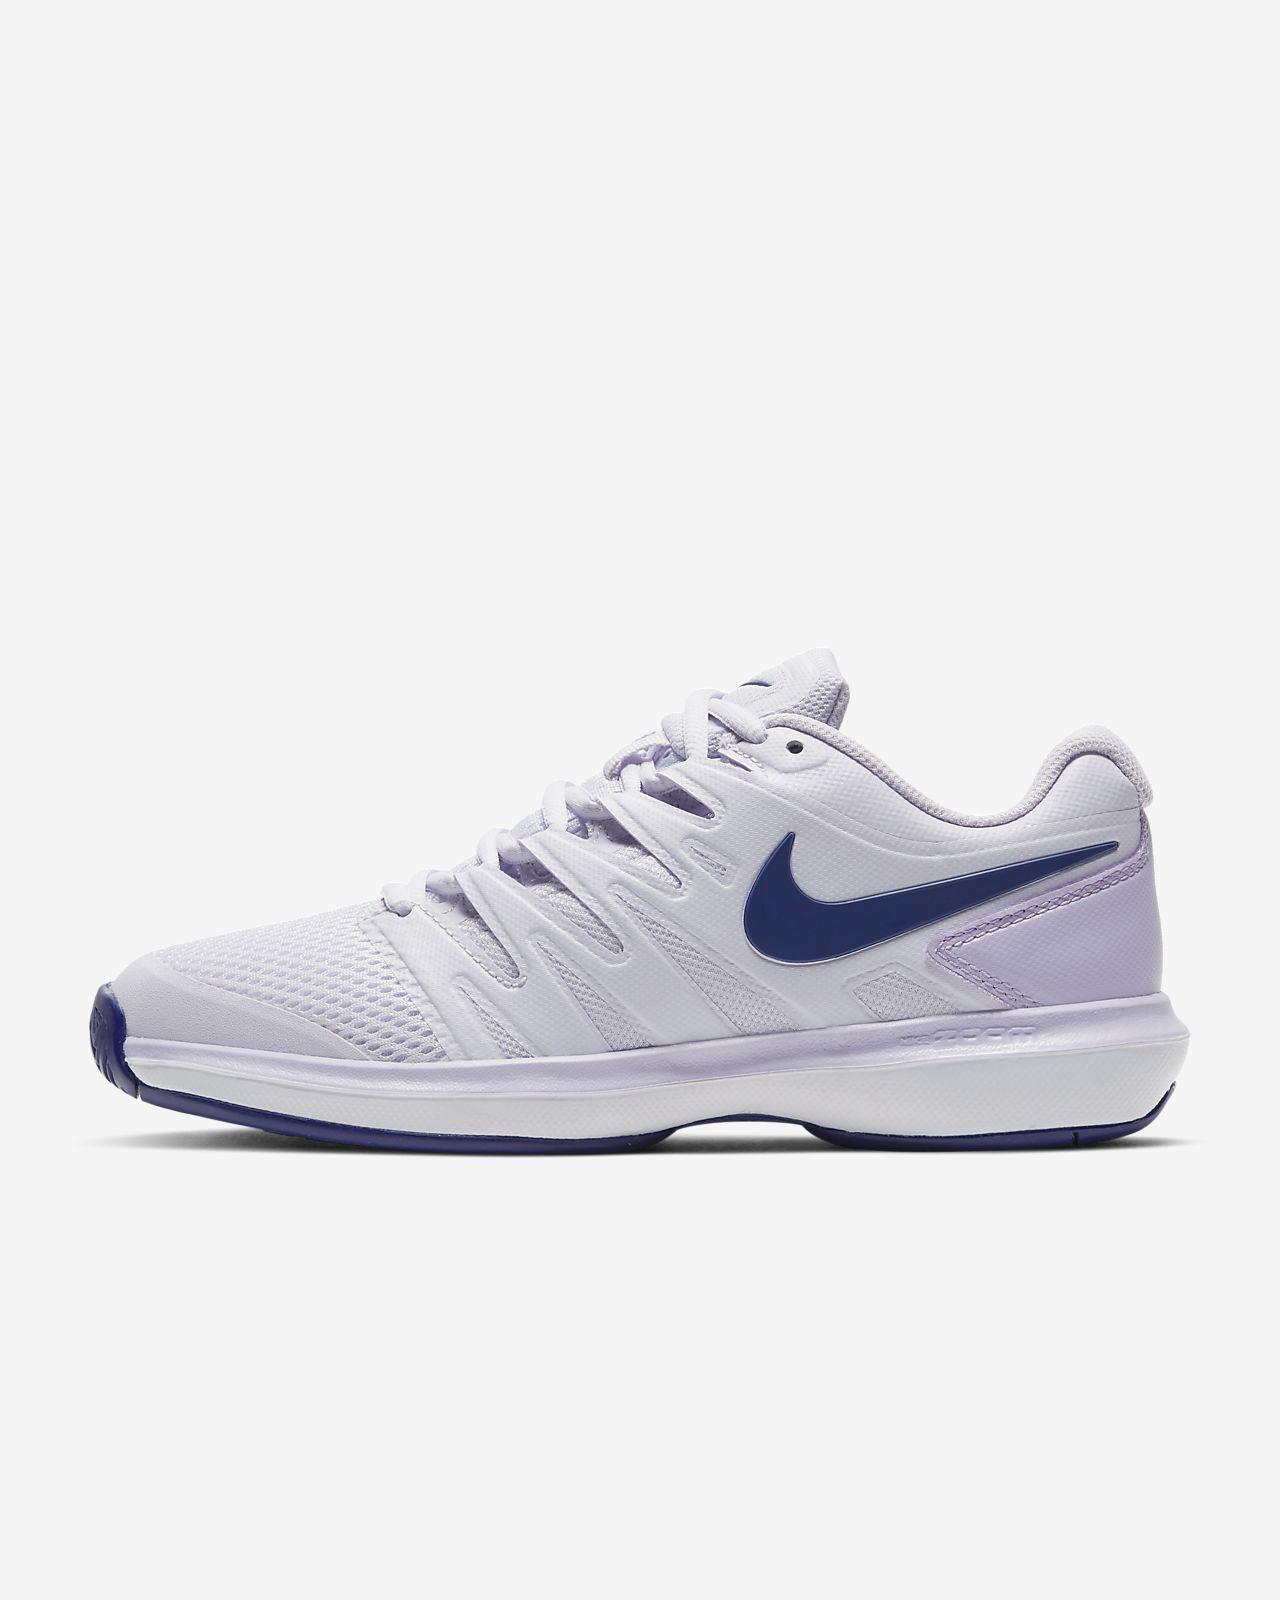 NikeCourt Air Zoom Prestige tennissko til kvinder